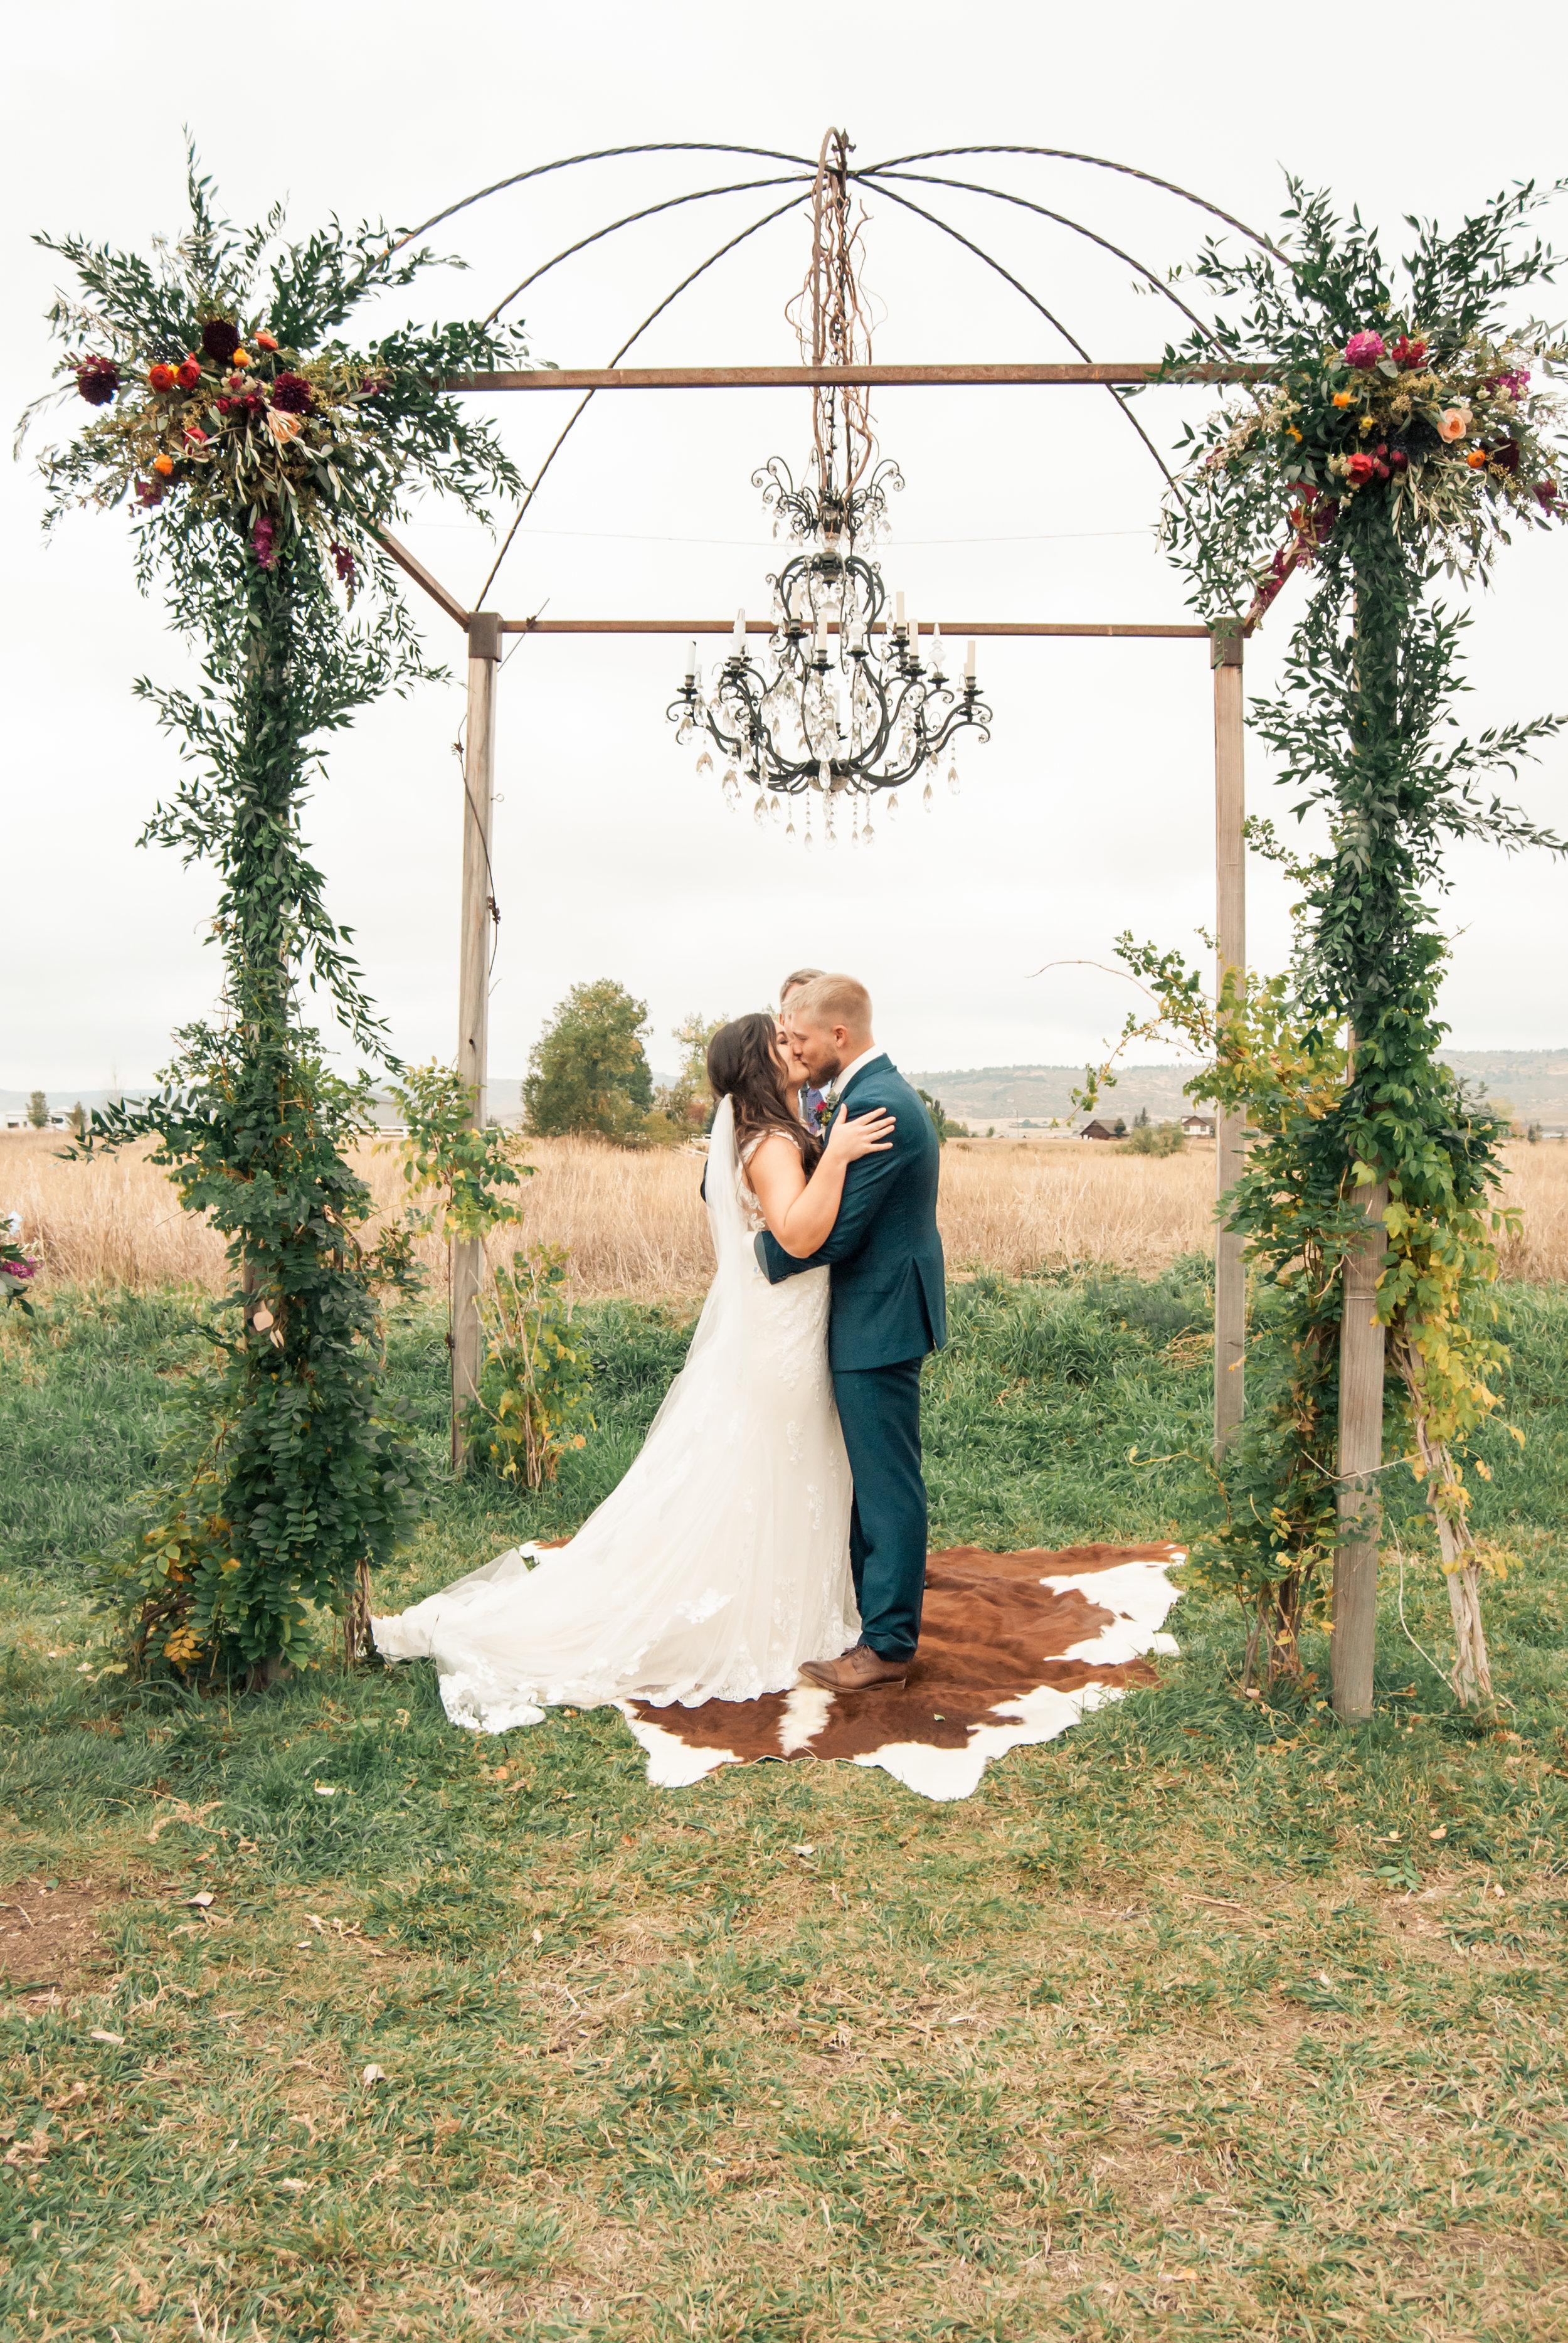 WeddingPortfolio-109.jpg